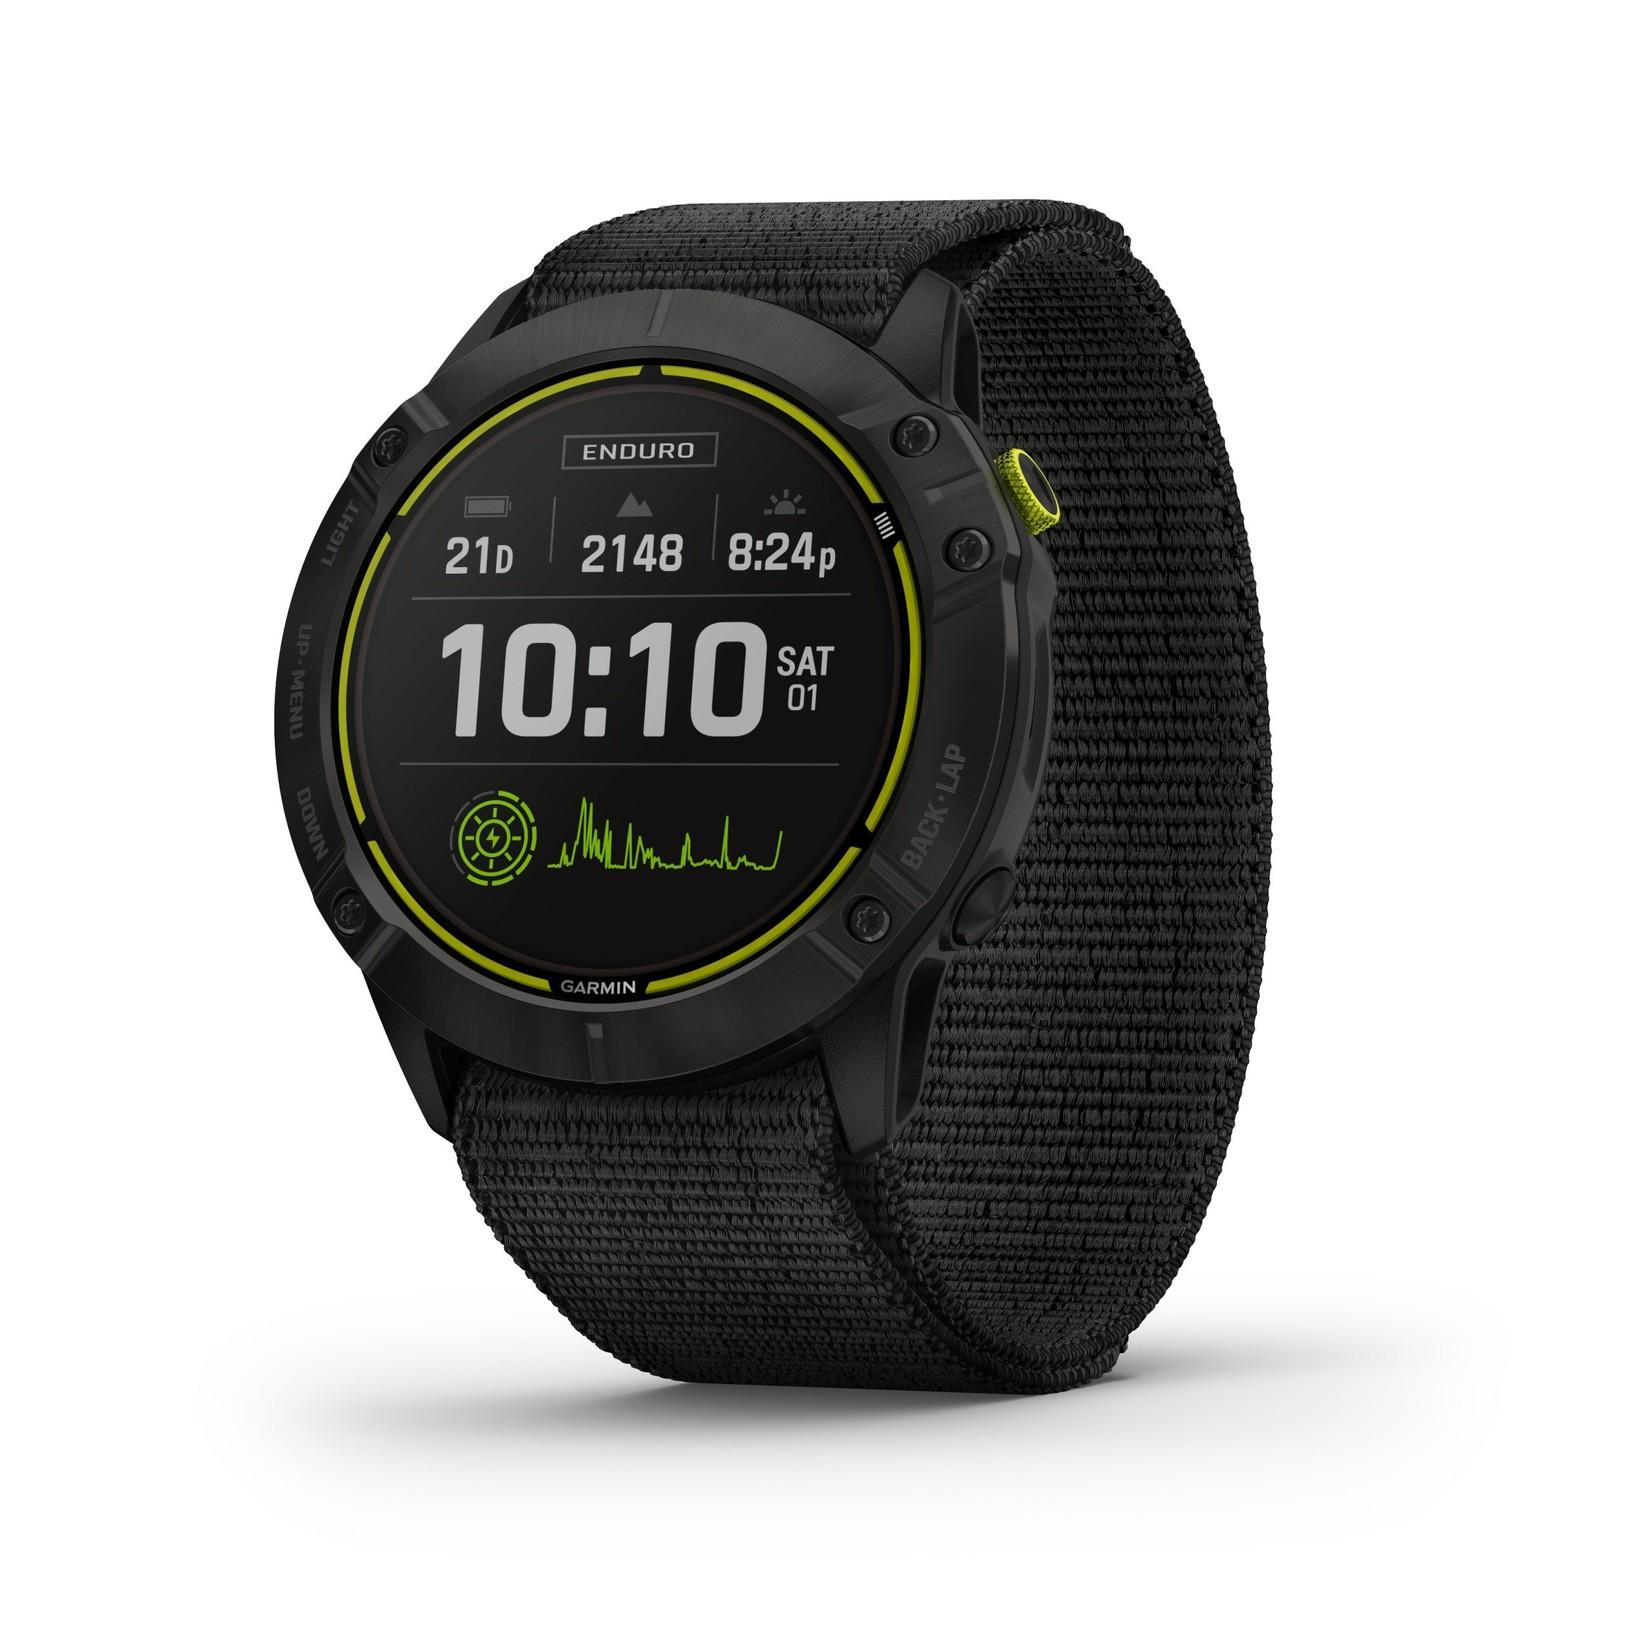 Garmin Enduro™ GPS Watch Carbon Gray DLC Titanium with Black UltraFit Nylon Strap